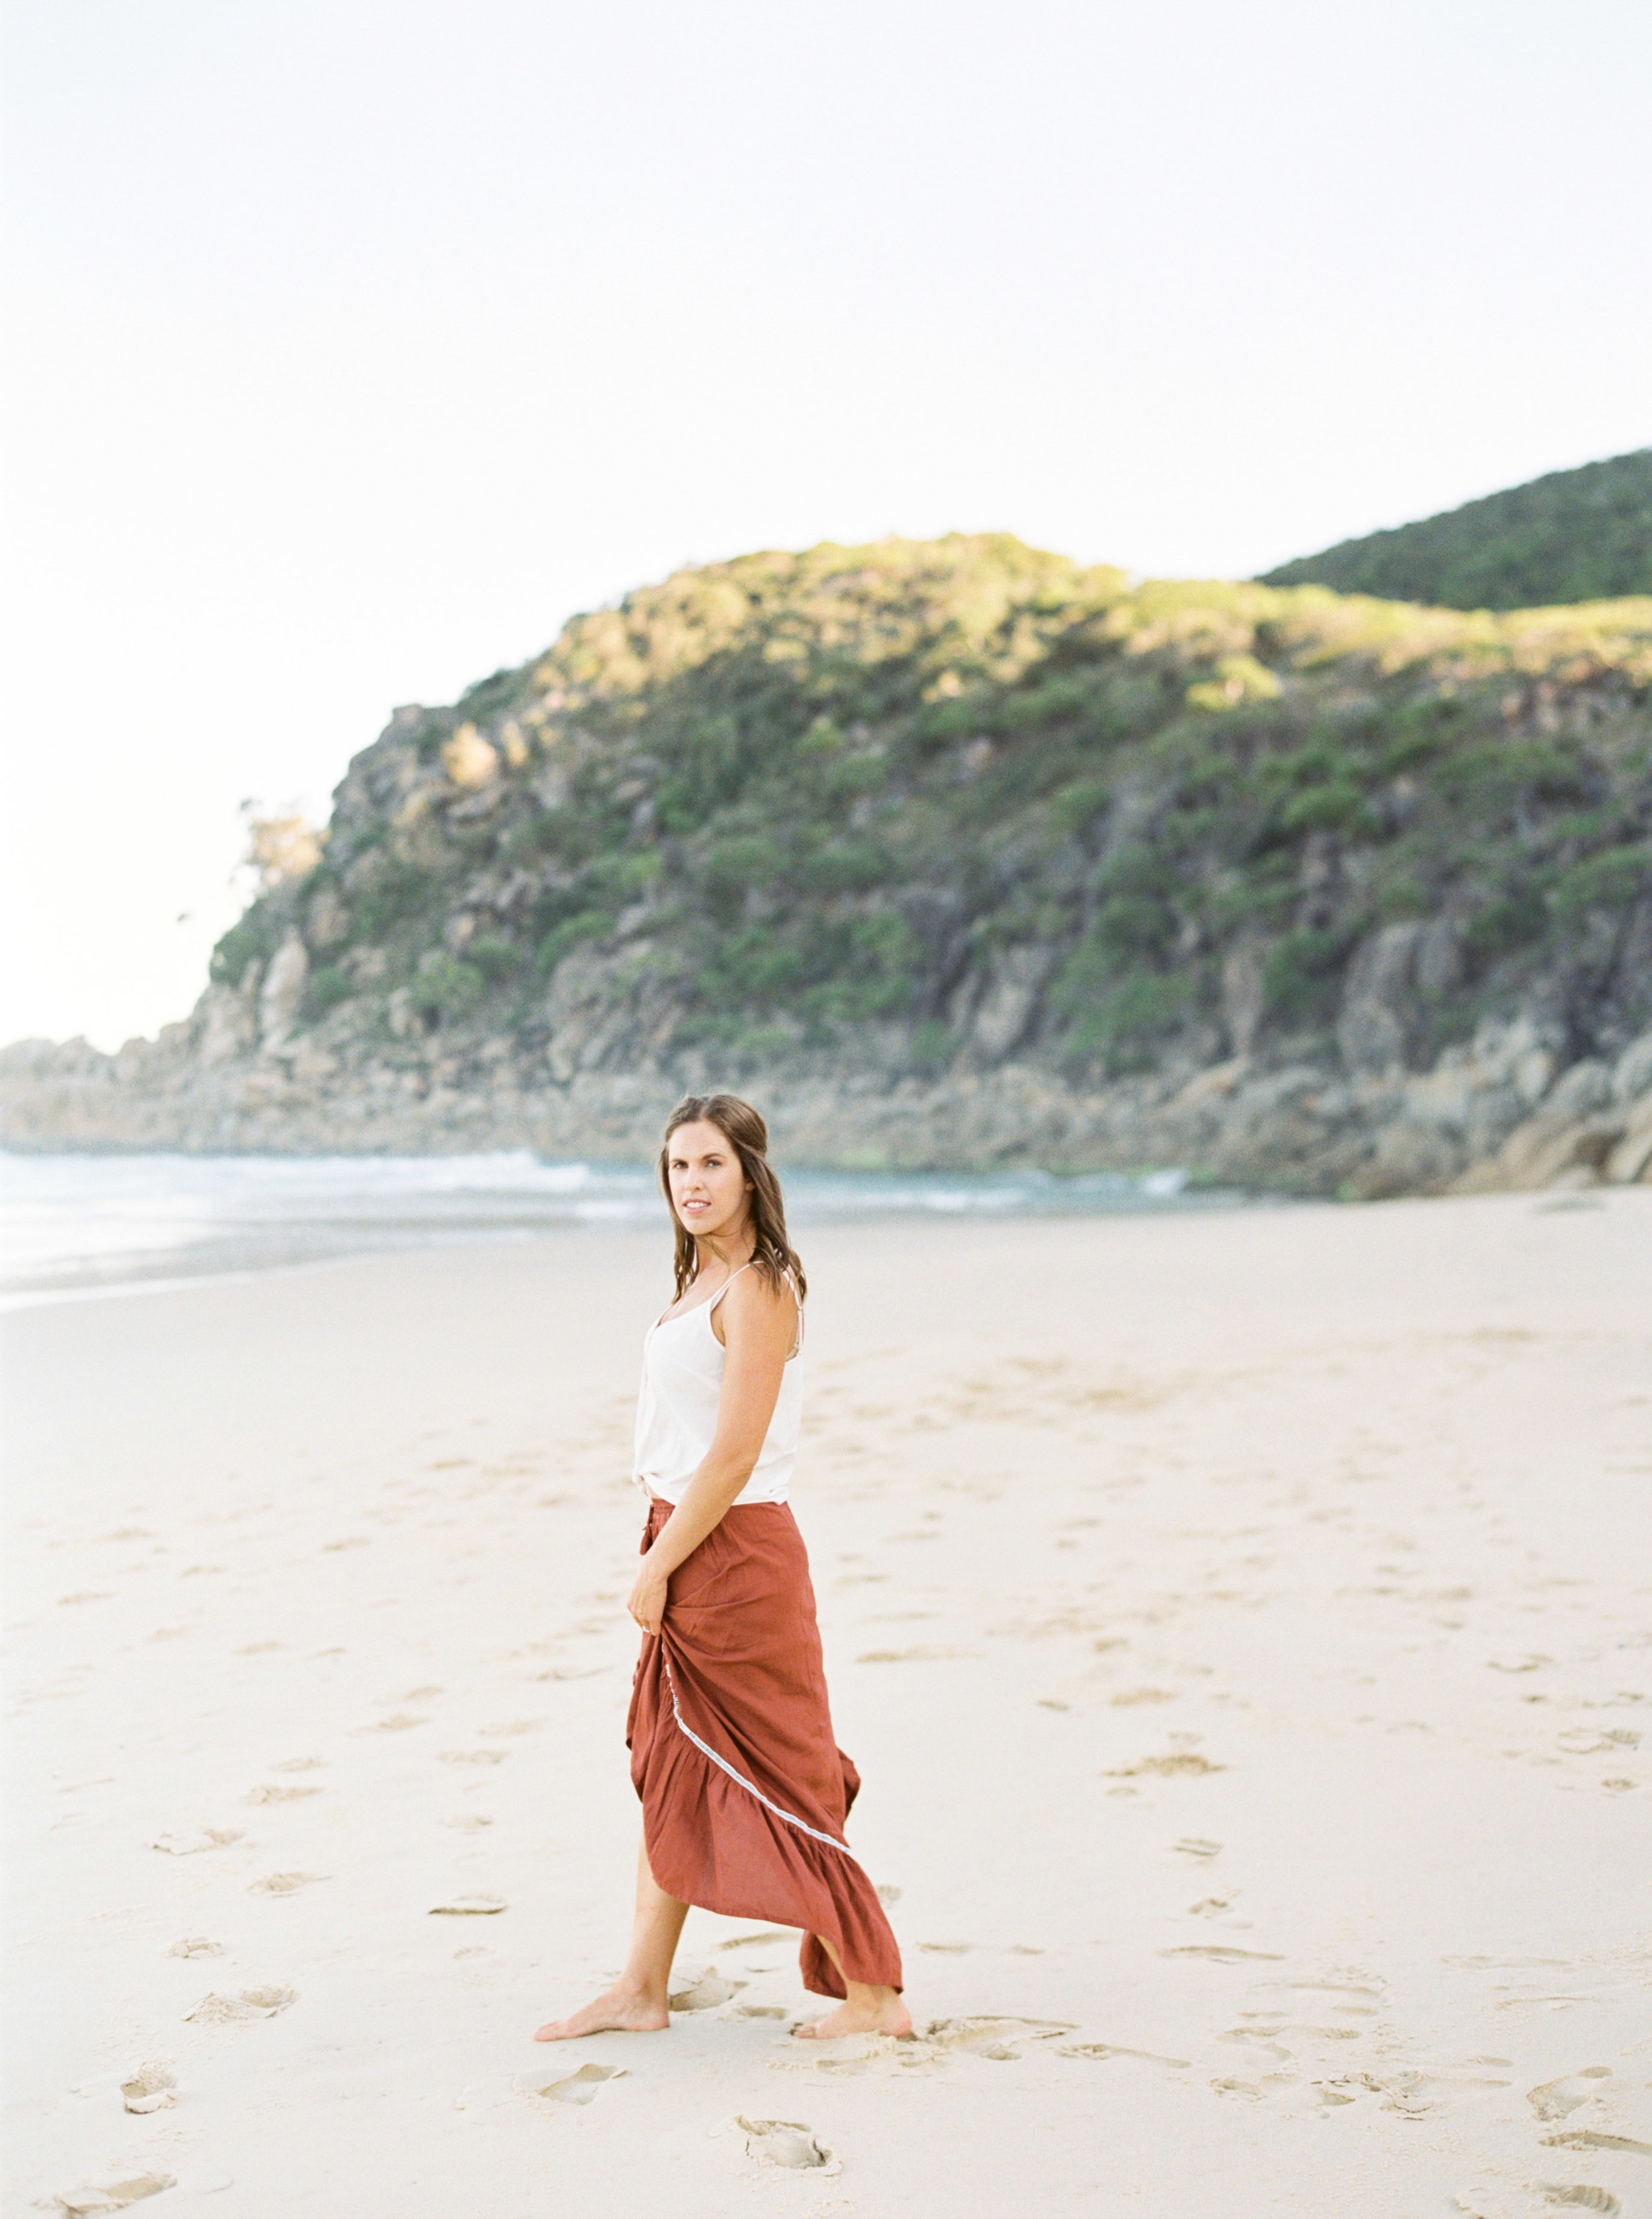 Sheri McMahon Fine Art Film Wedding Photographer Newcastle Central Coast NSW Australia.jpg